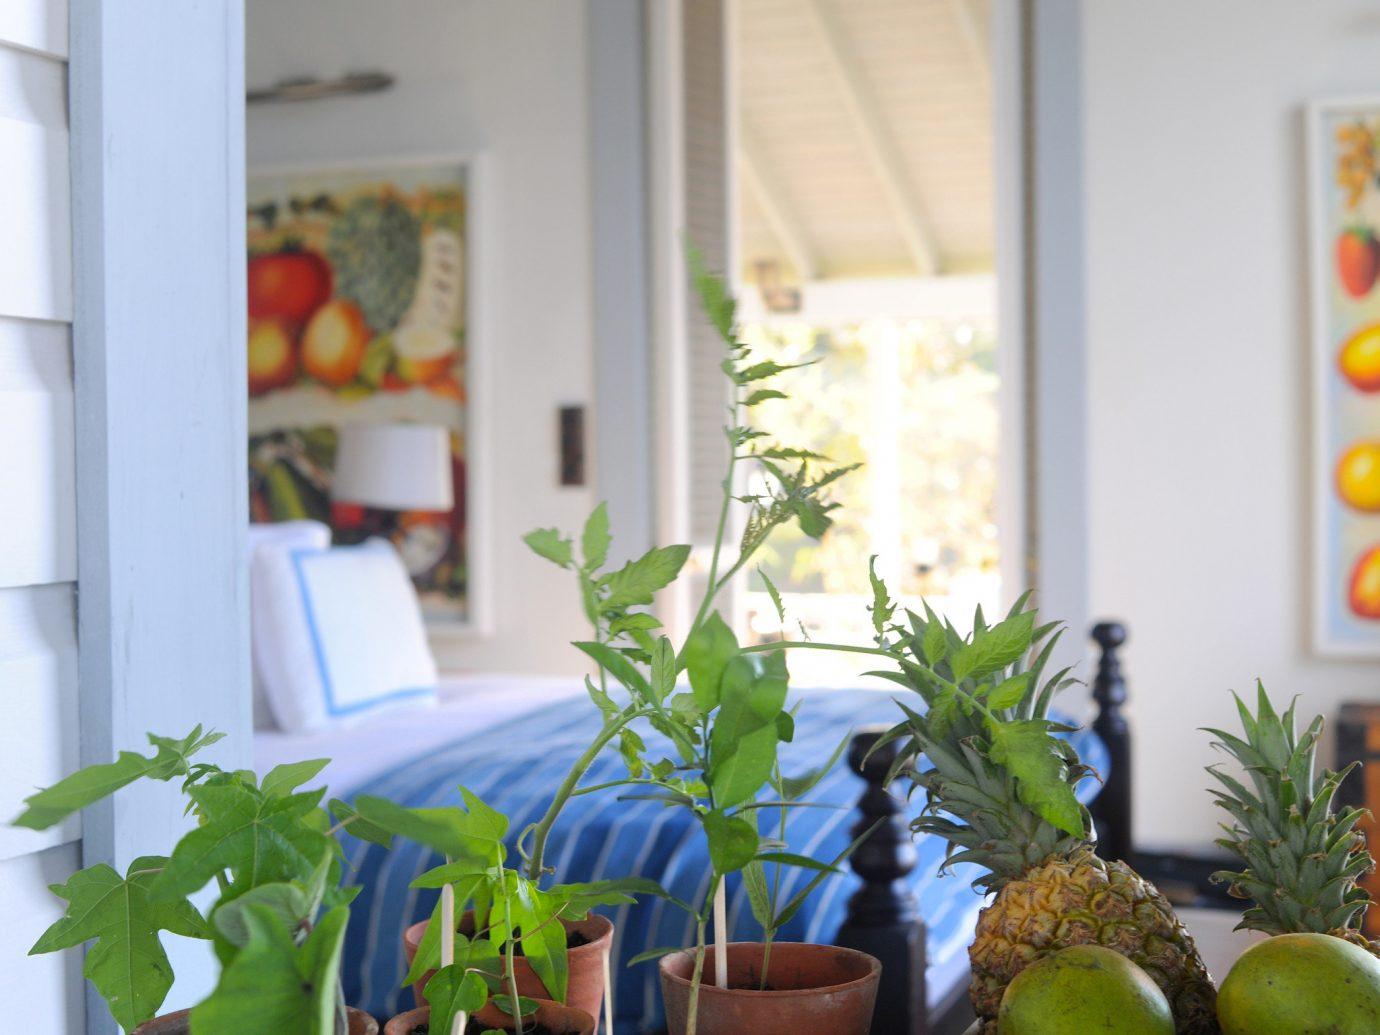 Trip Ideas room indoor floristry Balcony home flower window interior design plant cottage produce